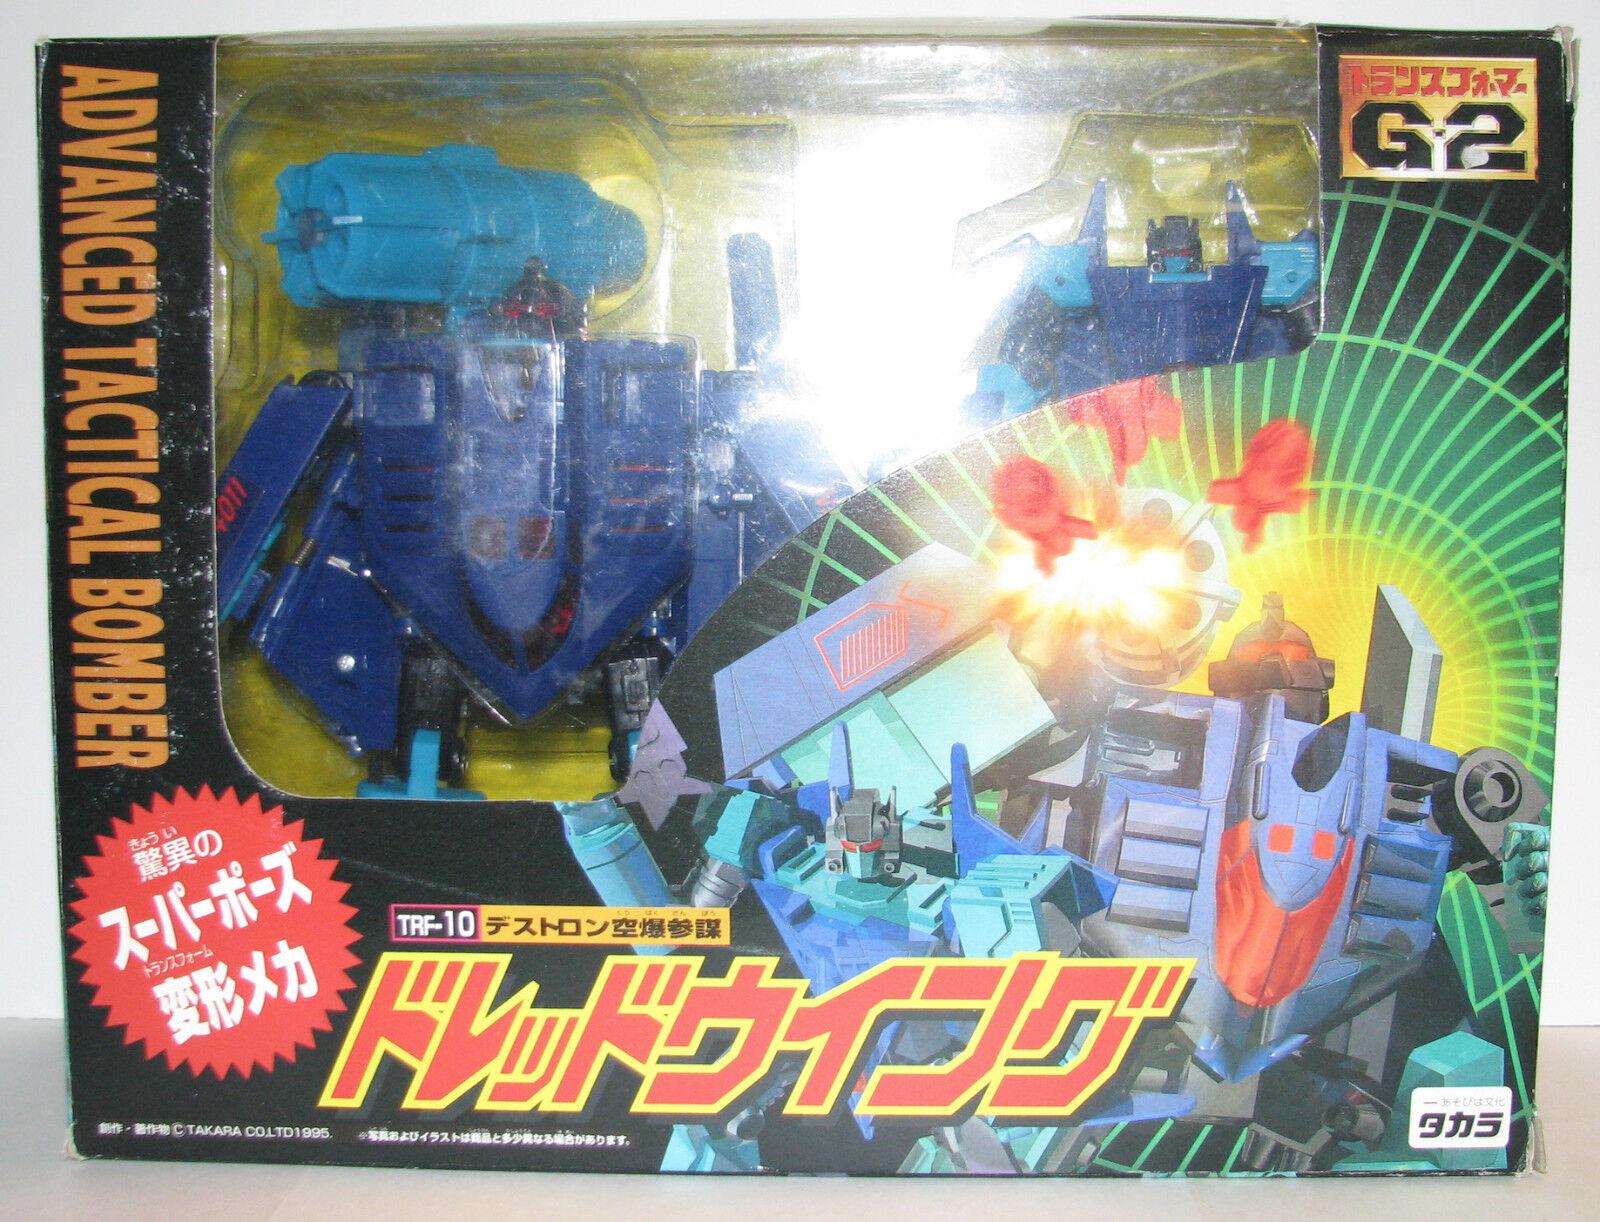 Takara Transformers Transformers Transformers Generation 2 TRF-10 Advance Tactical Bomber Dreadwing fbdc76